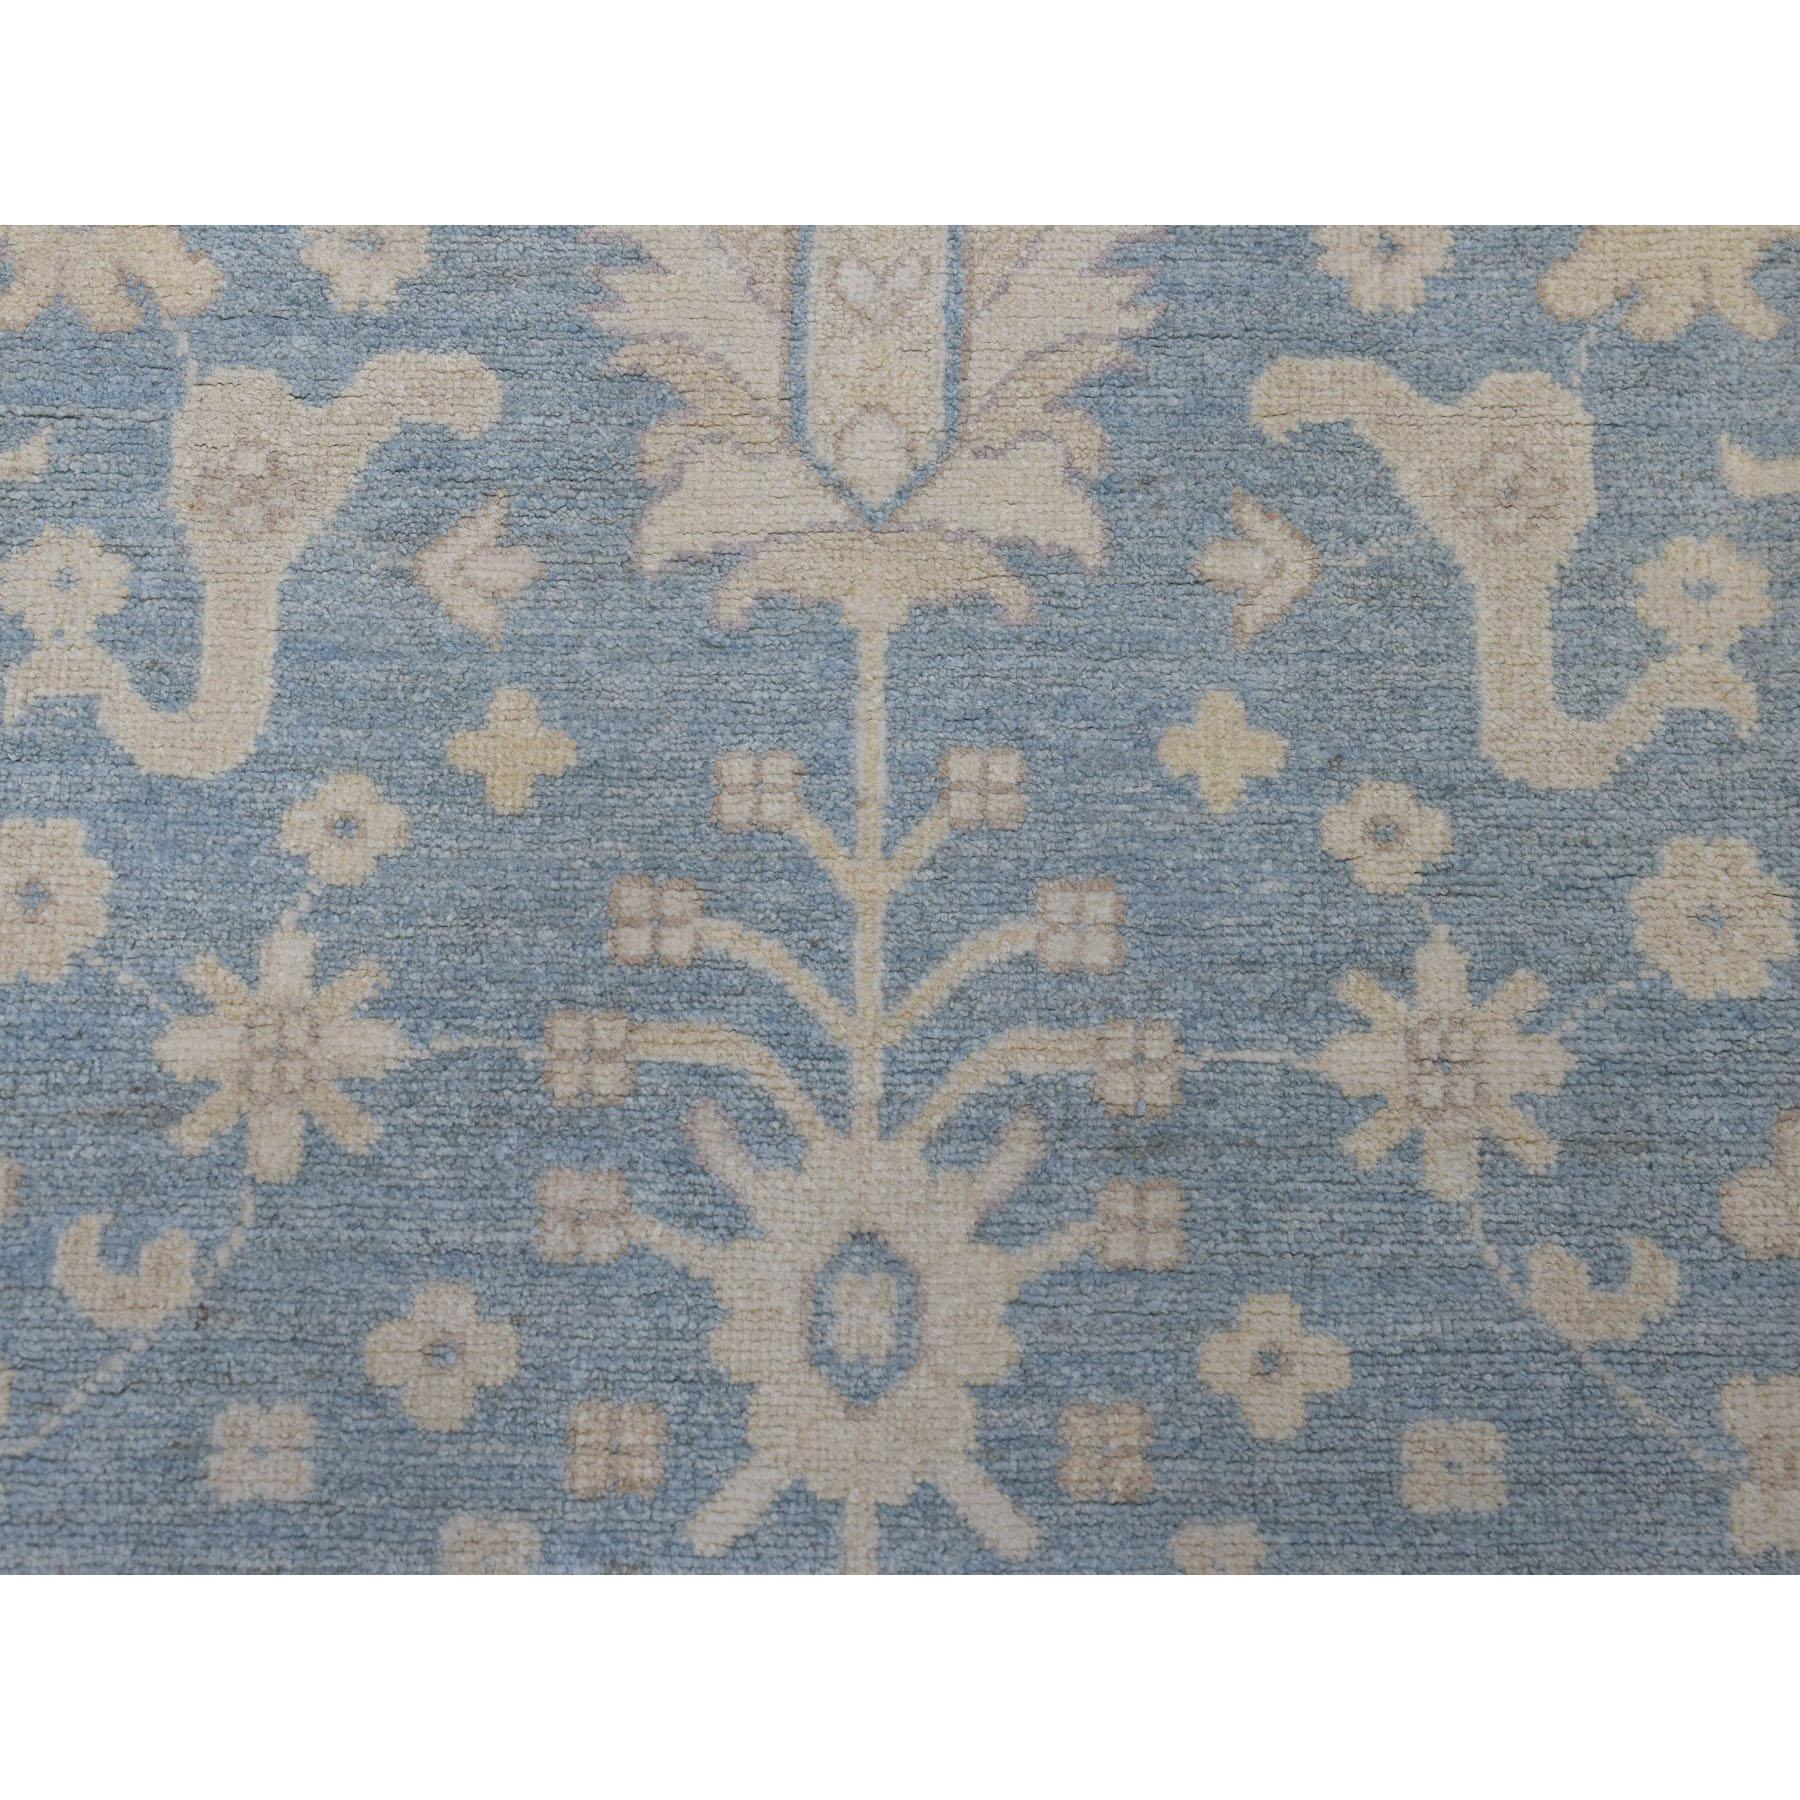 "2'7""x7'10"" Blue Stone Wash Peshawar Runner Pure Wool Hand Knotted Oriental Rug"